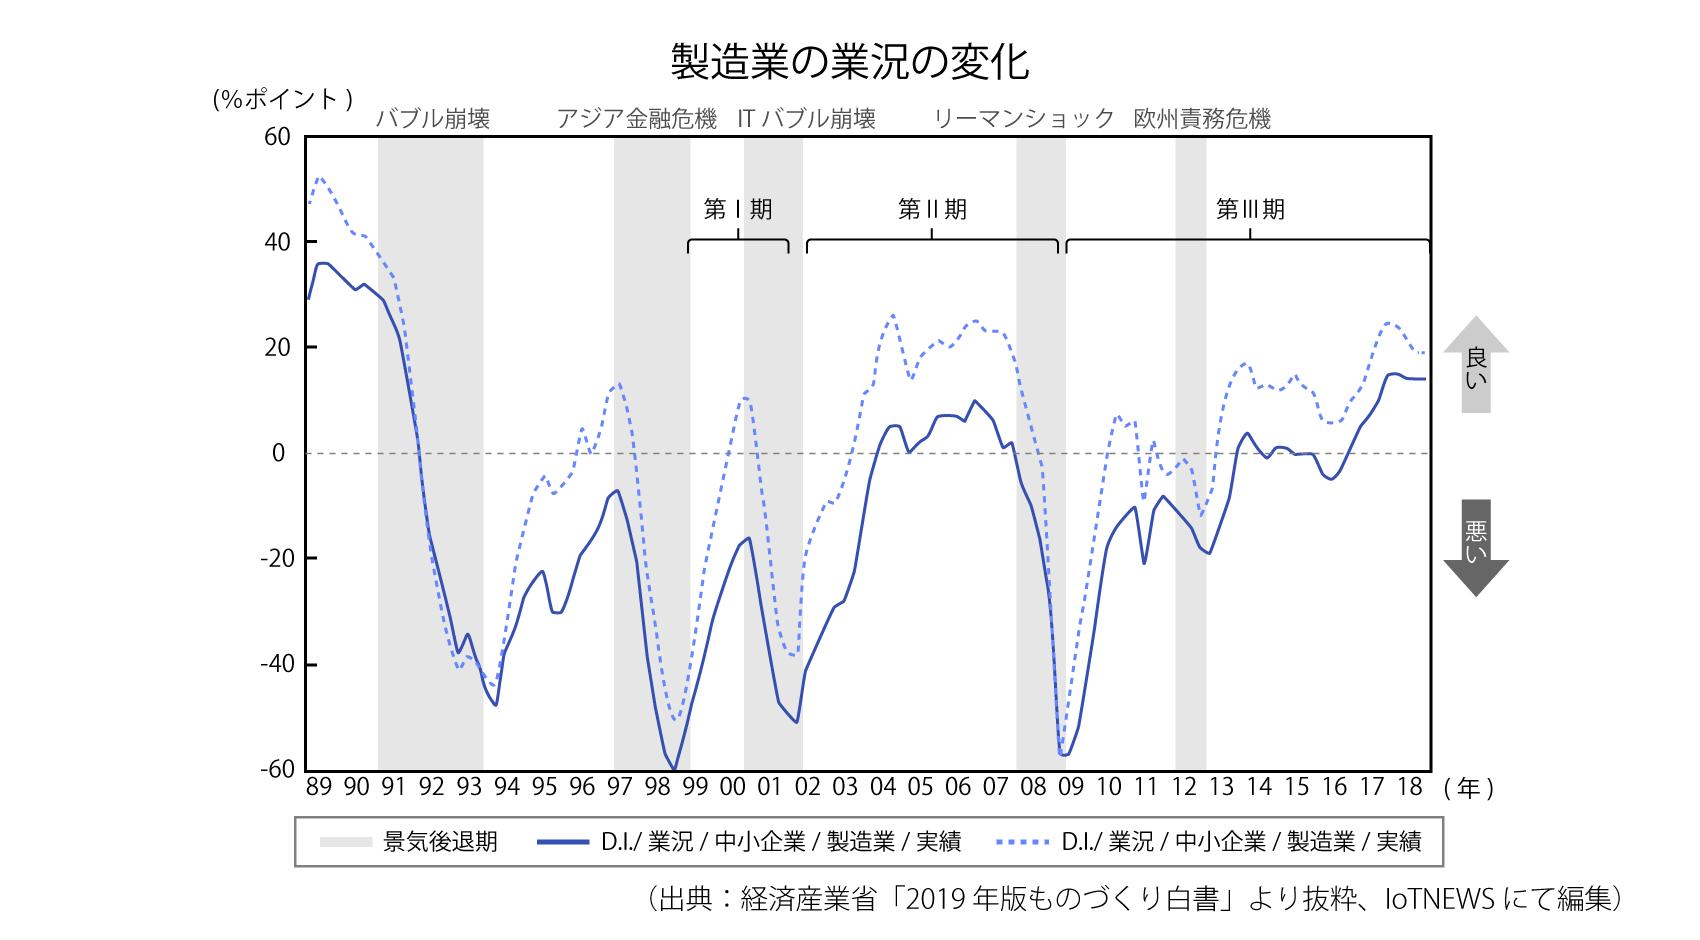 [p6-1]製造業の業況の変化